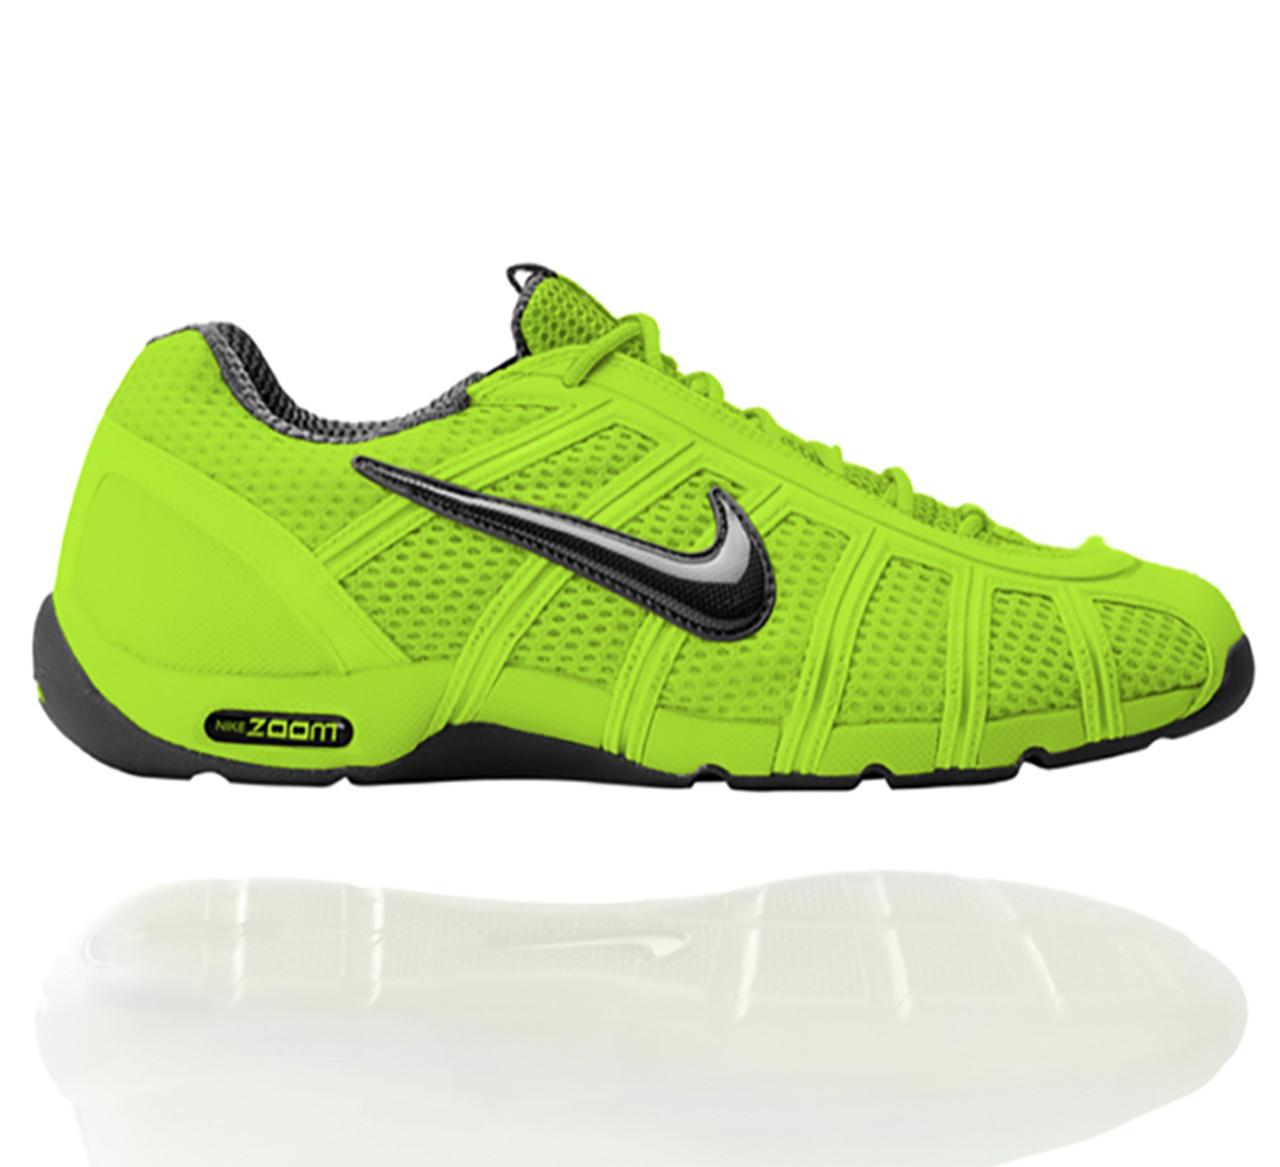 Nike Air Zoom Fencer Volt Sequoia